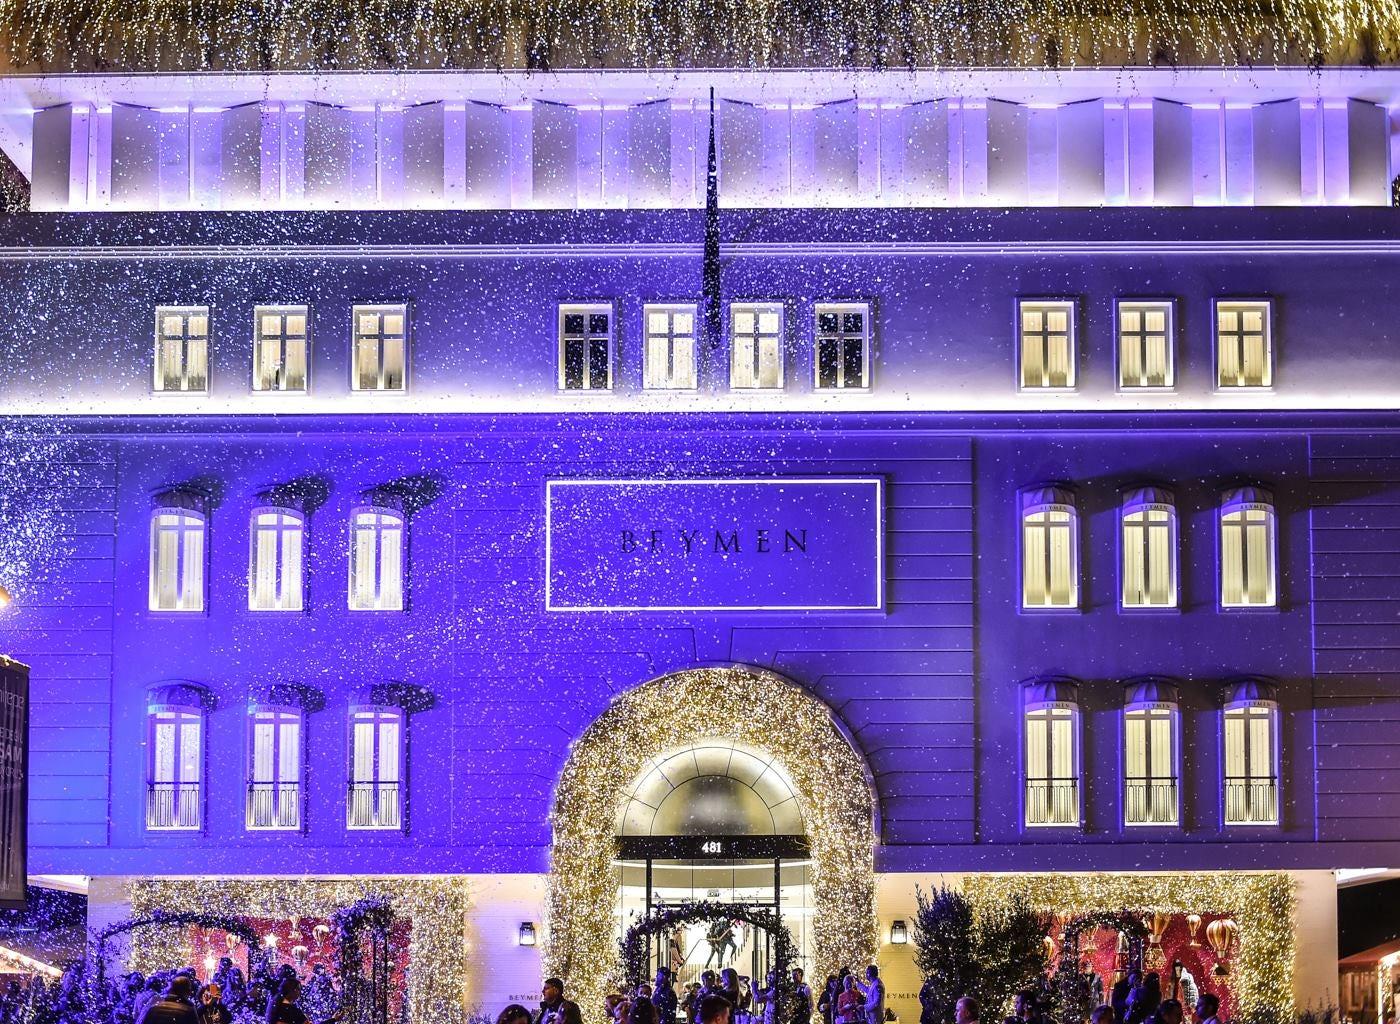 Turkish Luxury Retailer Beymen Said to Explore IPO